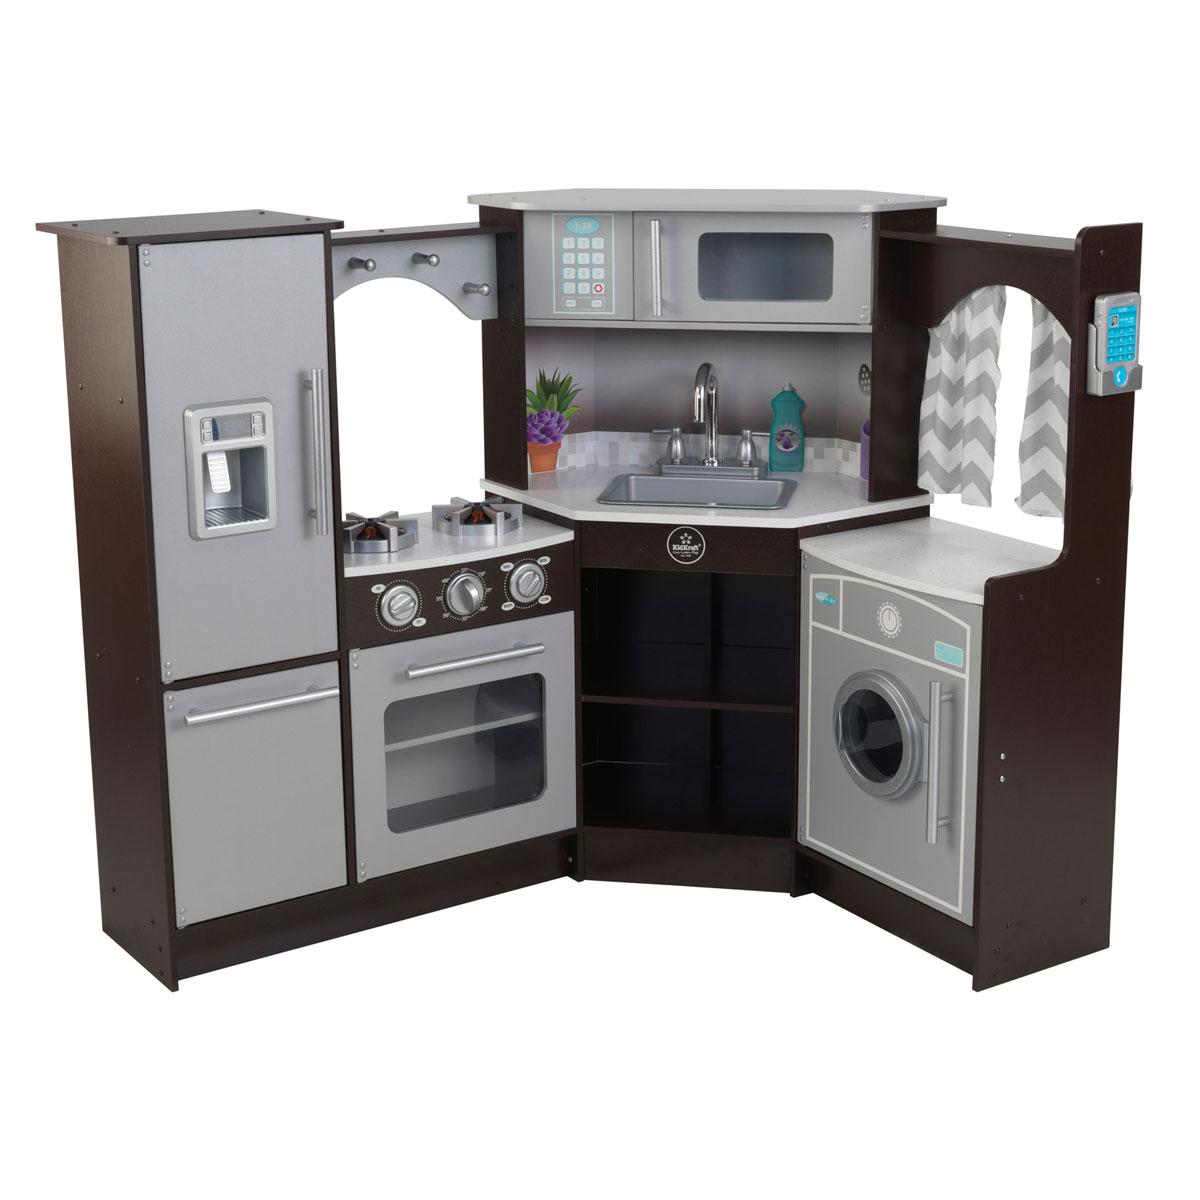 Kidkraft Play Kitchen Reviews